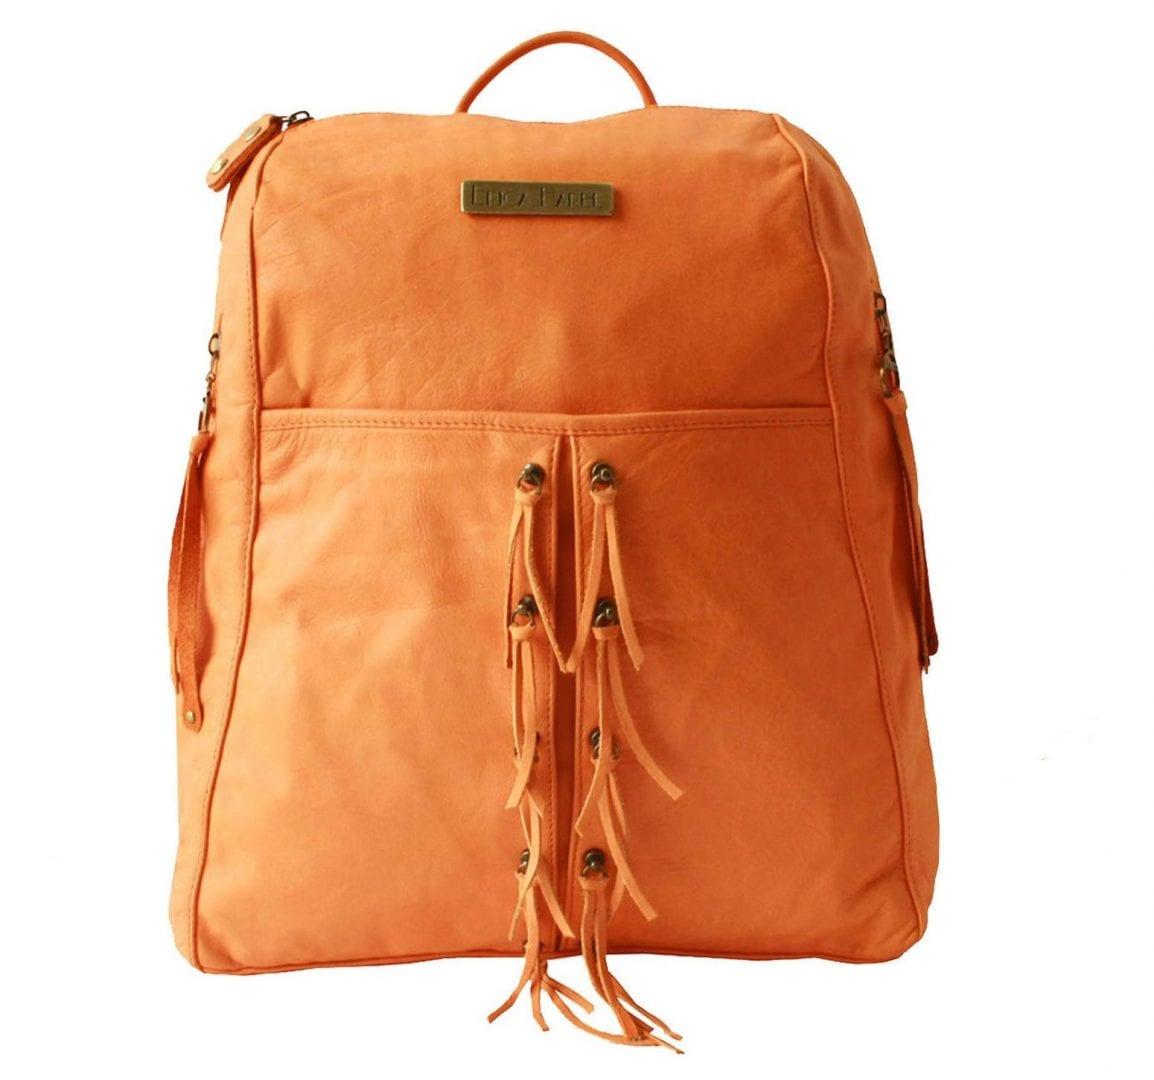 soft orange leather backpack